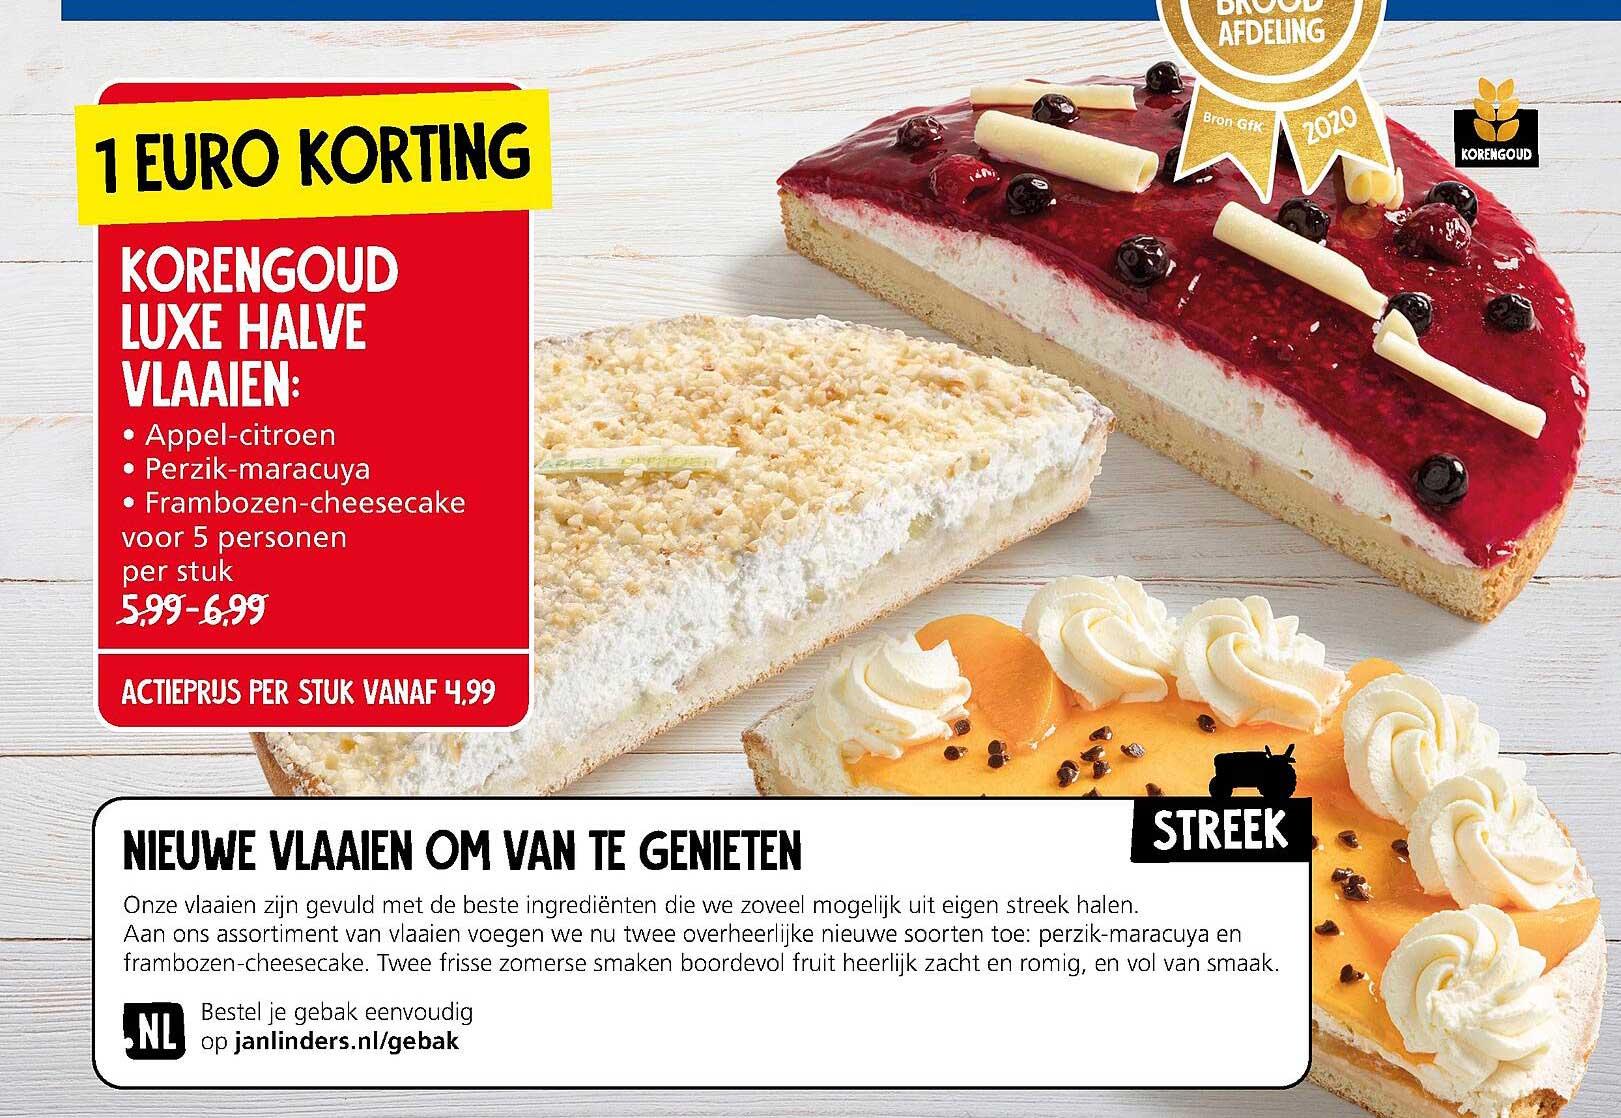 Jan Linders Korengoud Luxe Halve Vlaaien : Appel-Citroen, Perzik-Maracuya Of Frambozen-Cheesecake